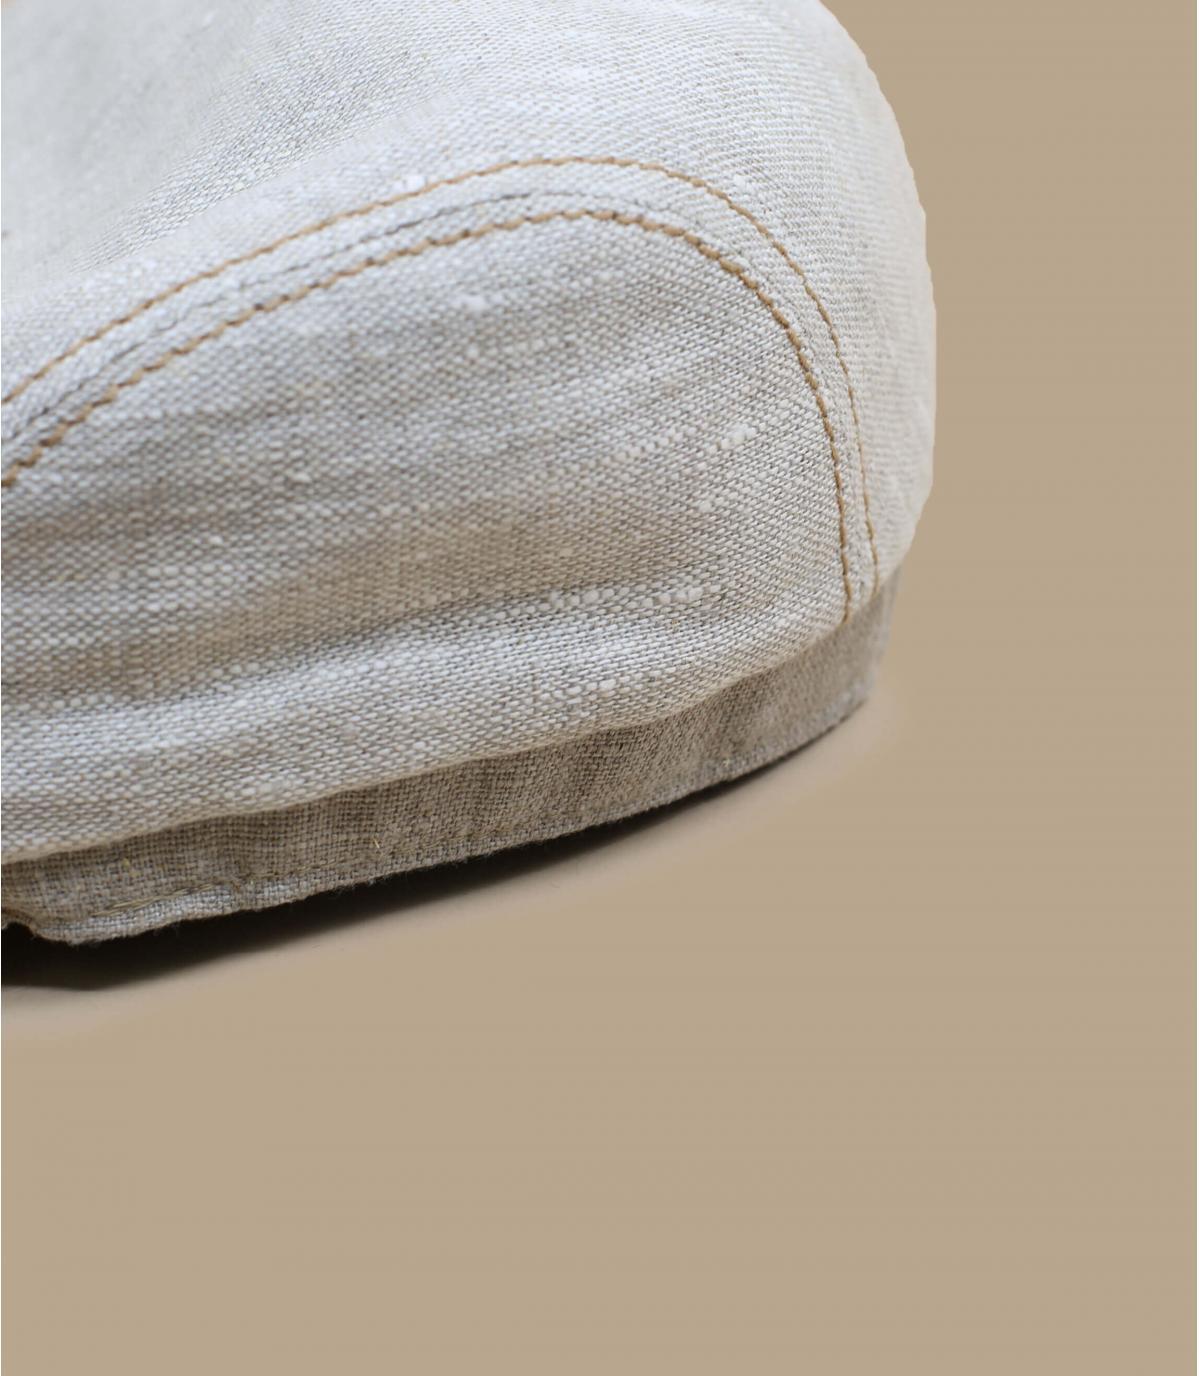 Détails Liverpool Lino delave Bic grege beige - image 2